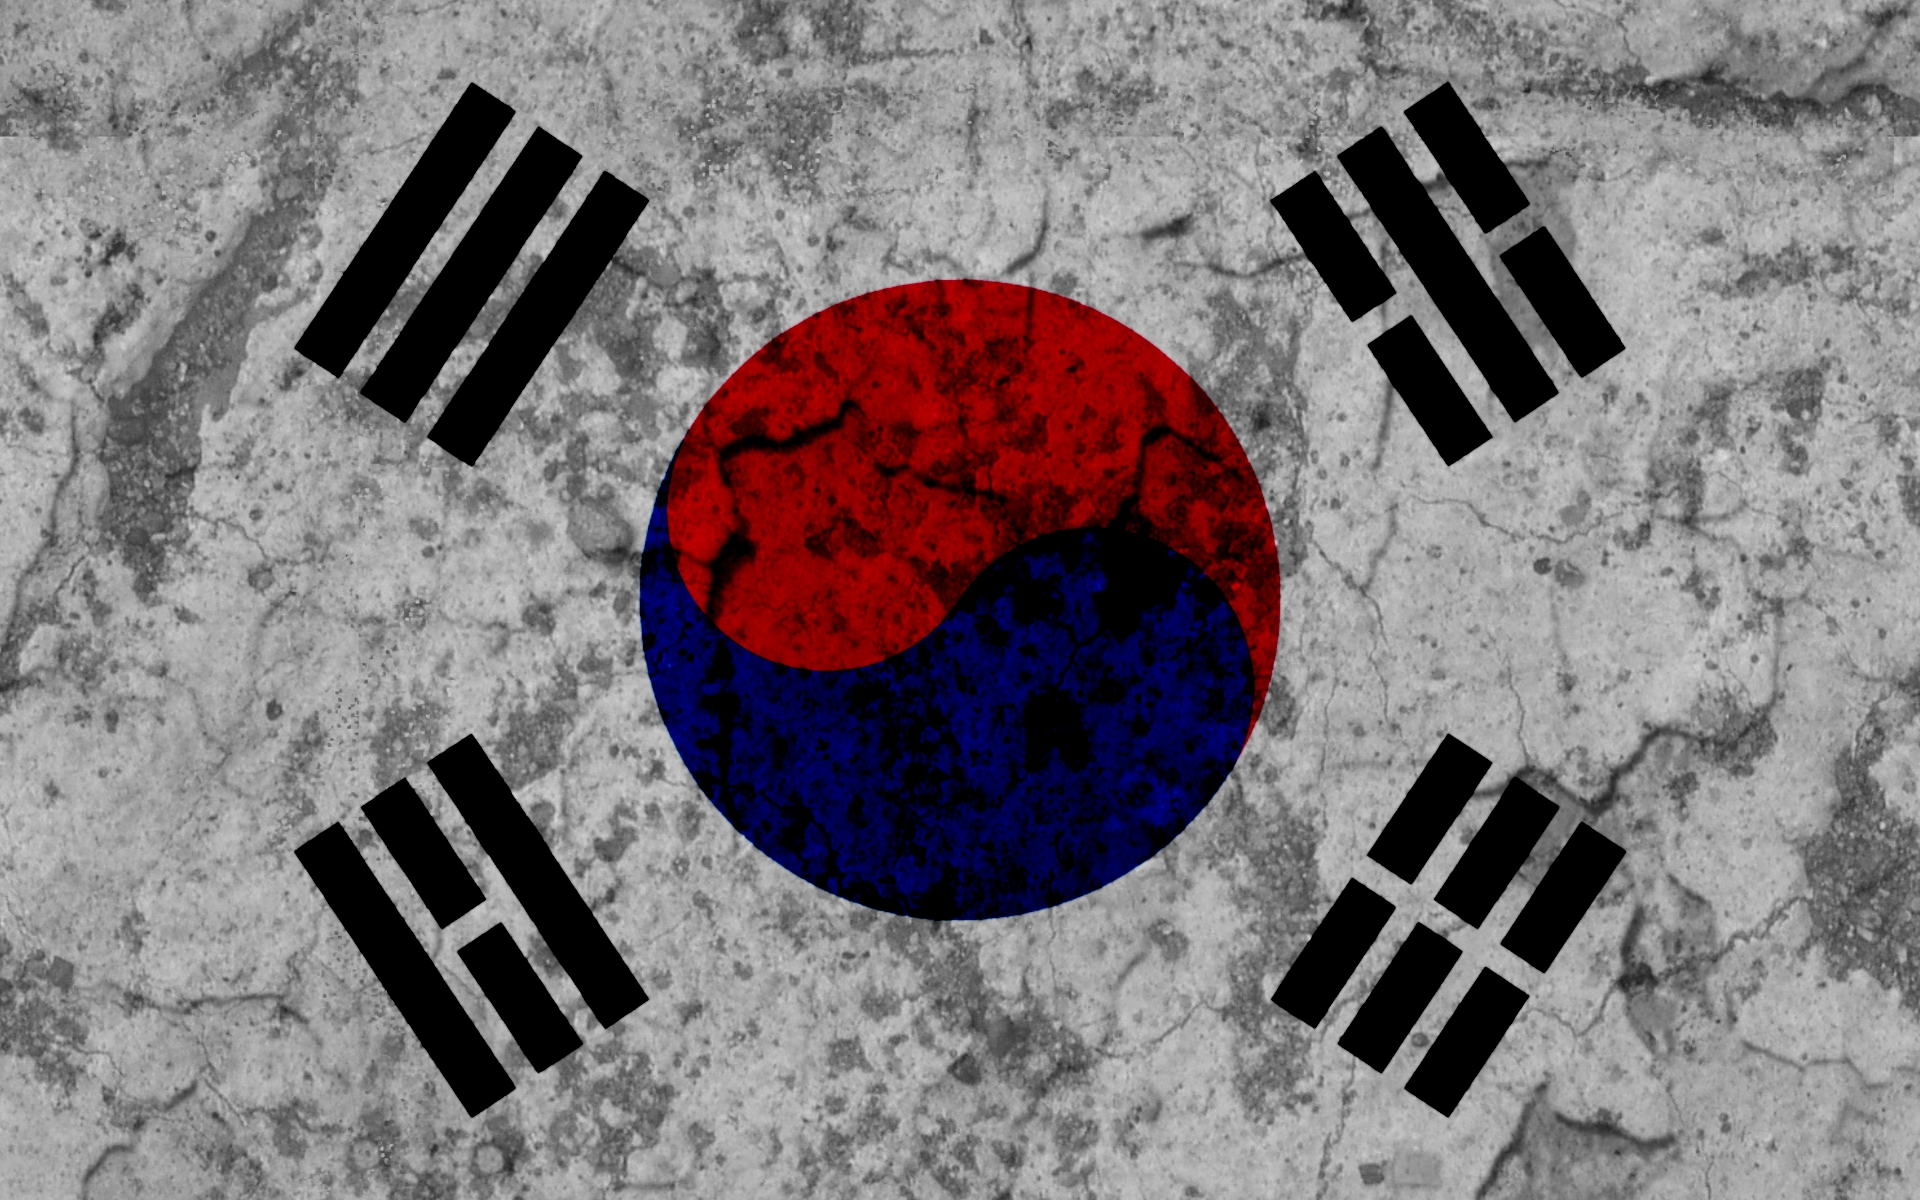 Flag of south korea hd wallpaper background image 1920x1200 id 65505 wallpaper abyss - South korea wallpaper hd ...